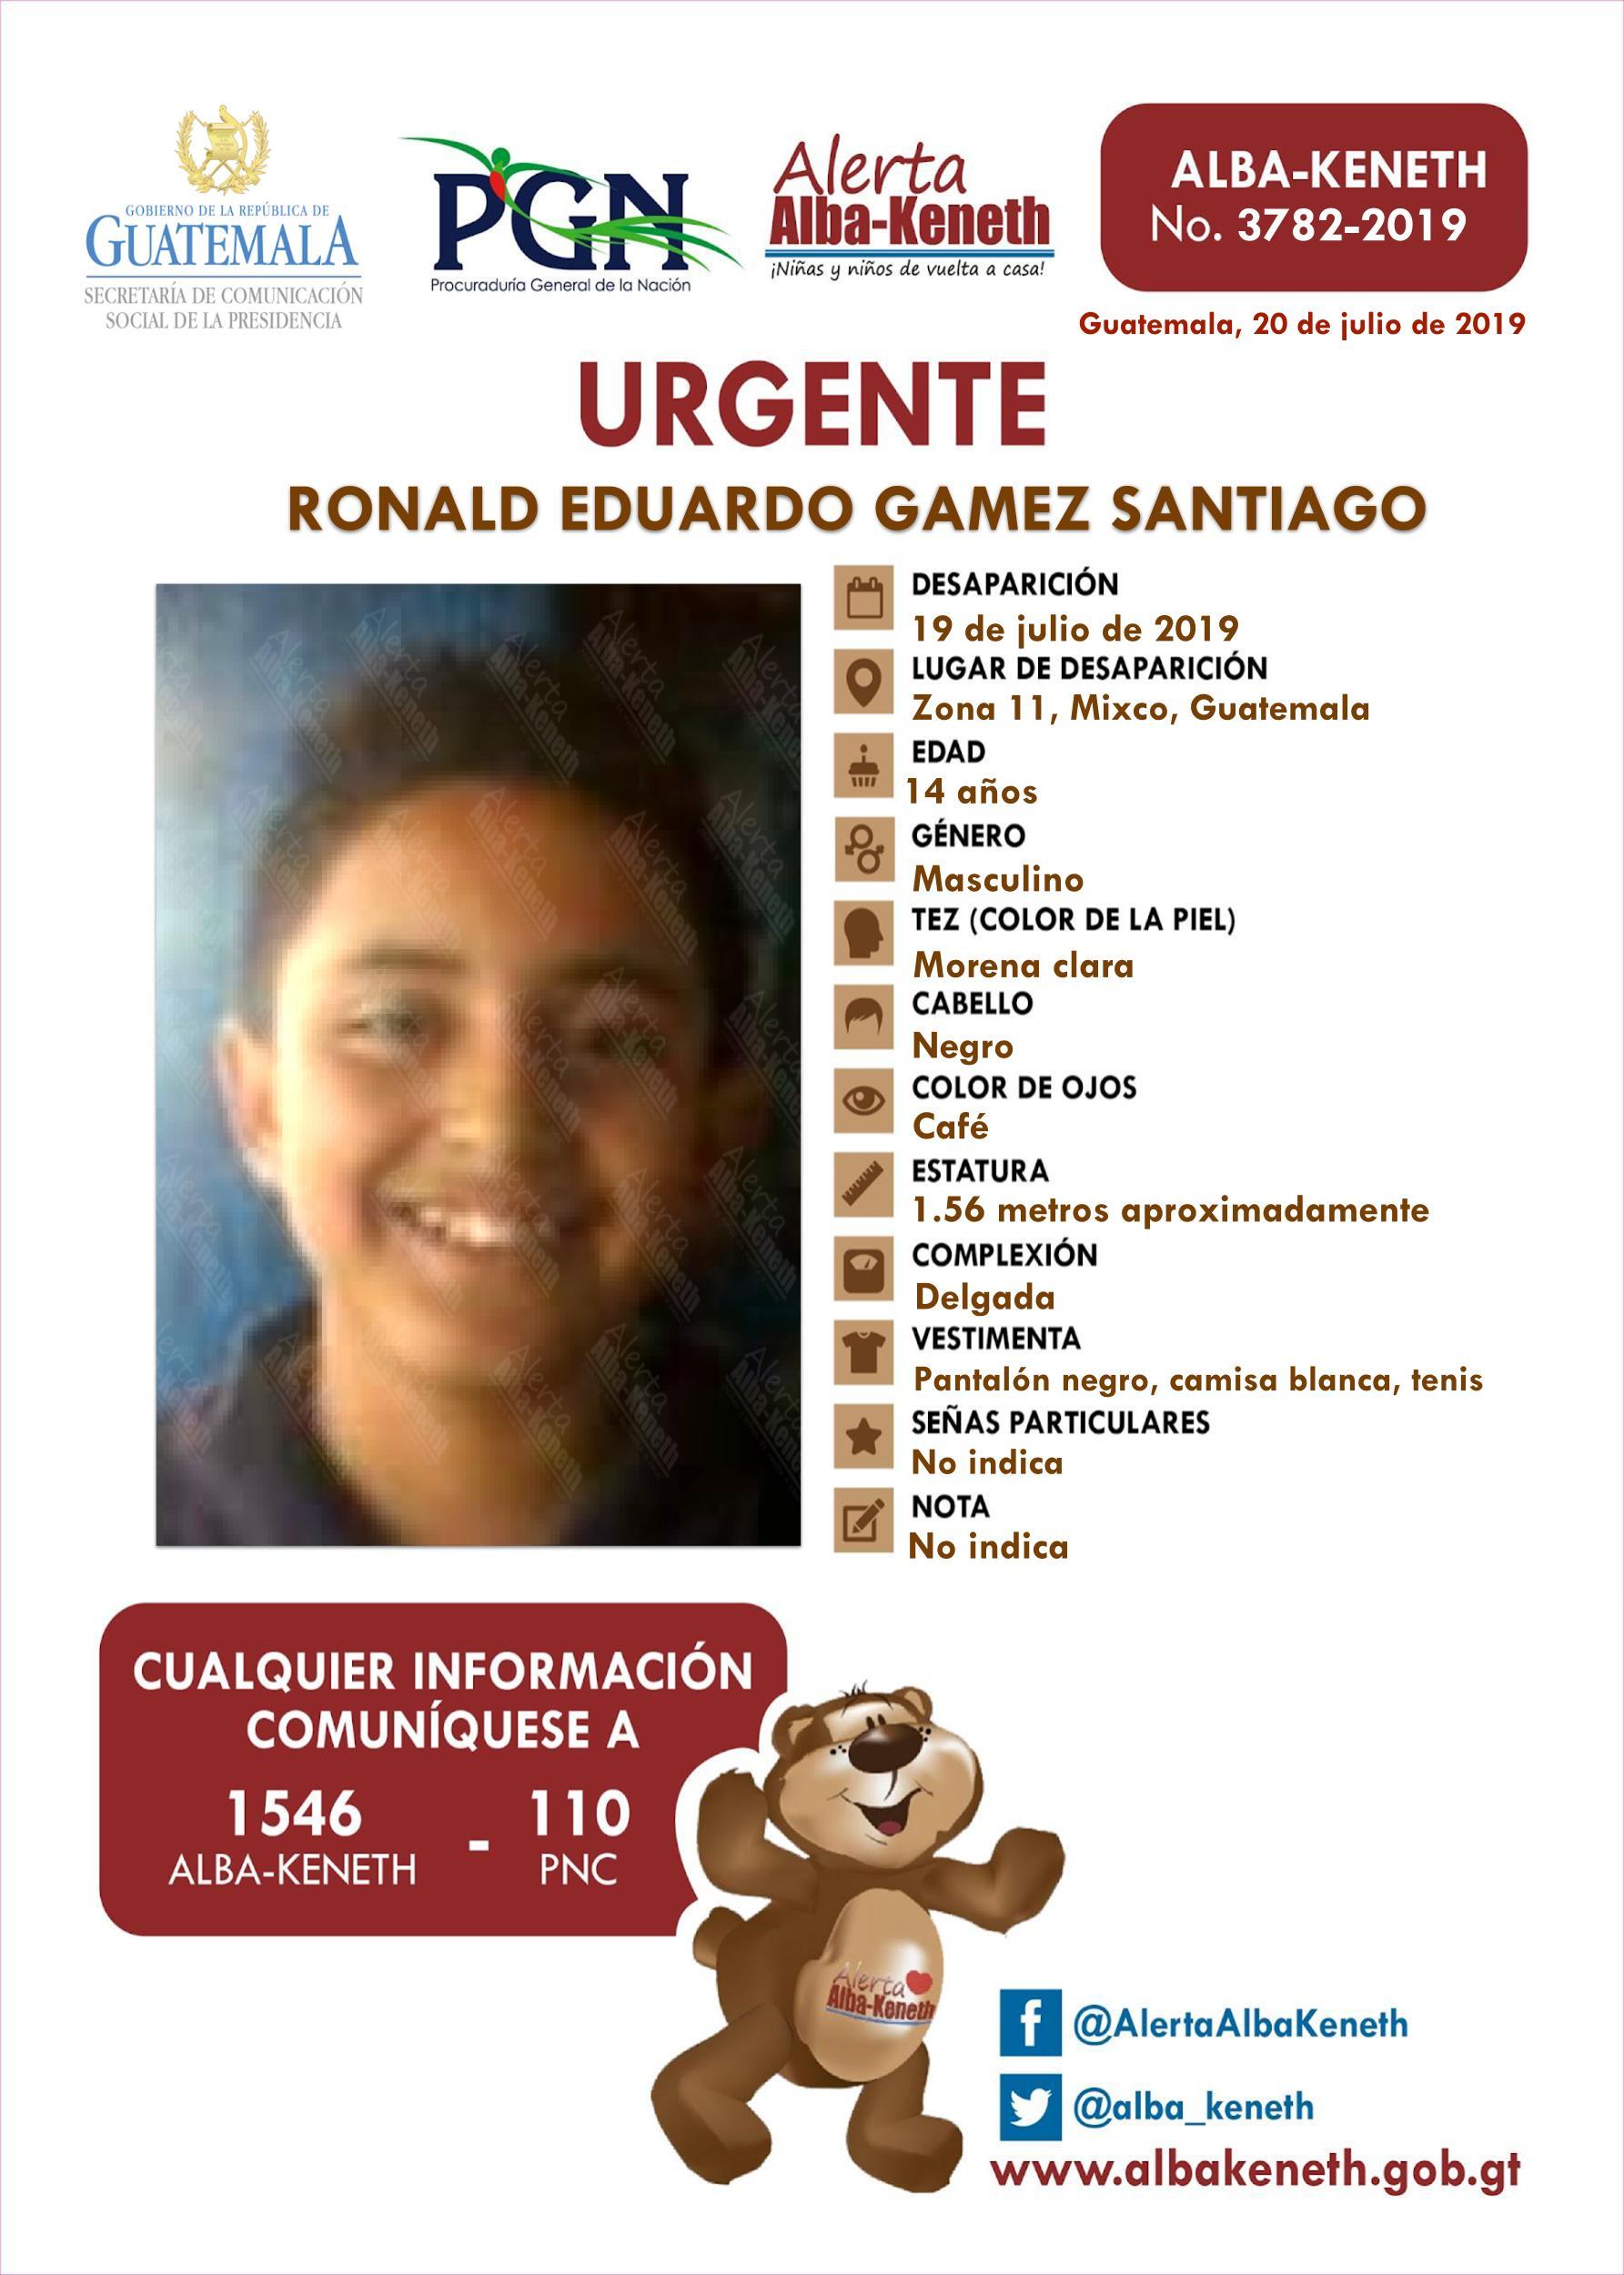 Ronald Eduardo Gamez Santiango